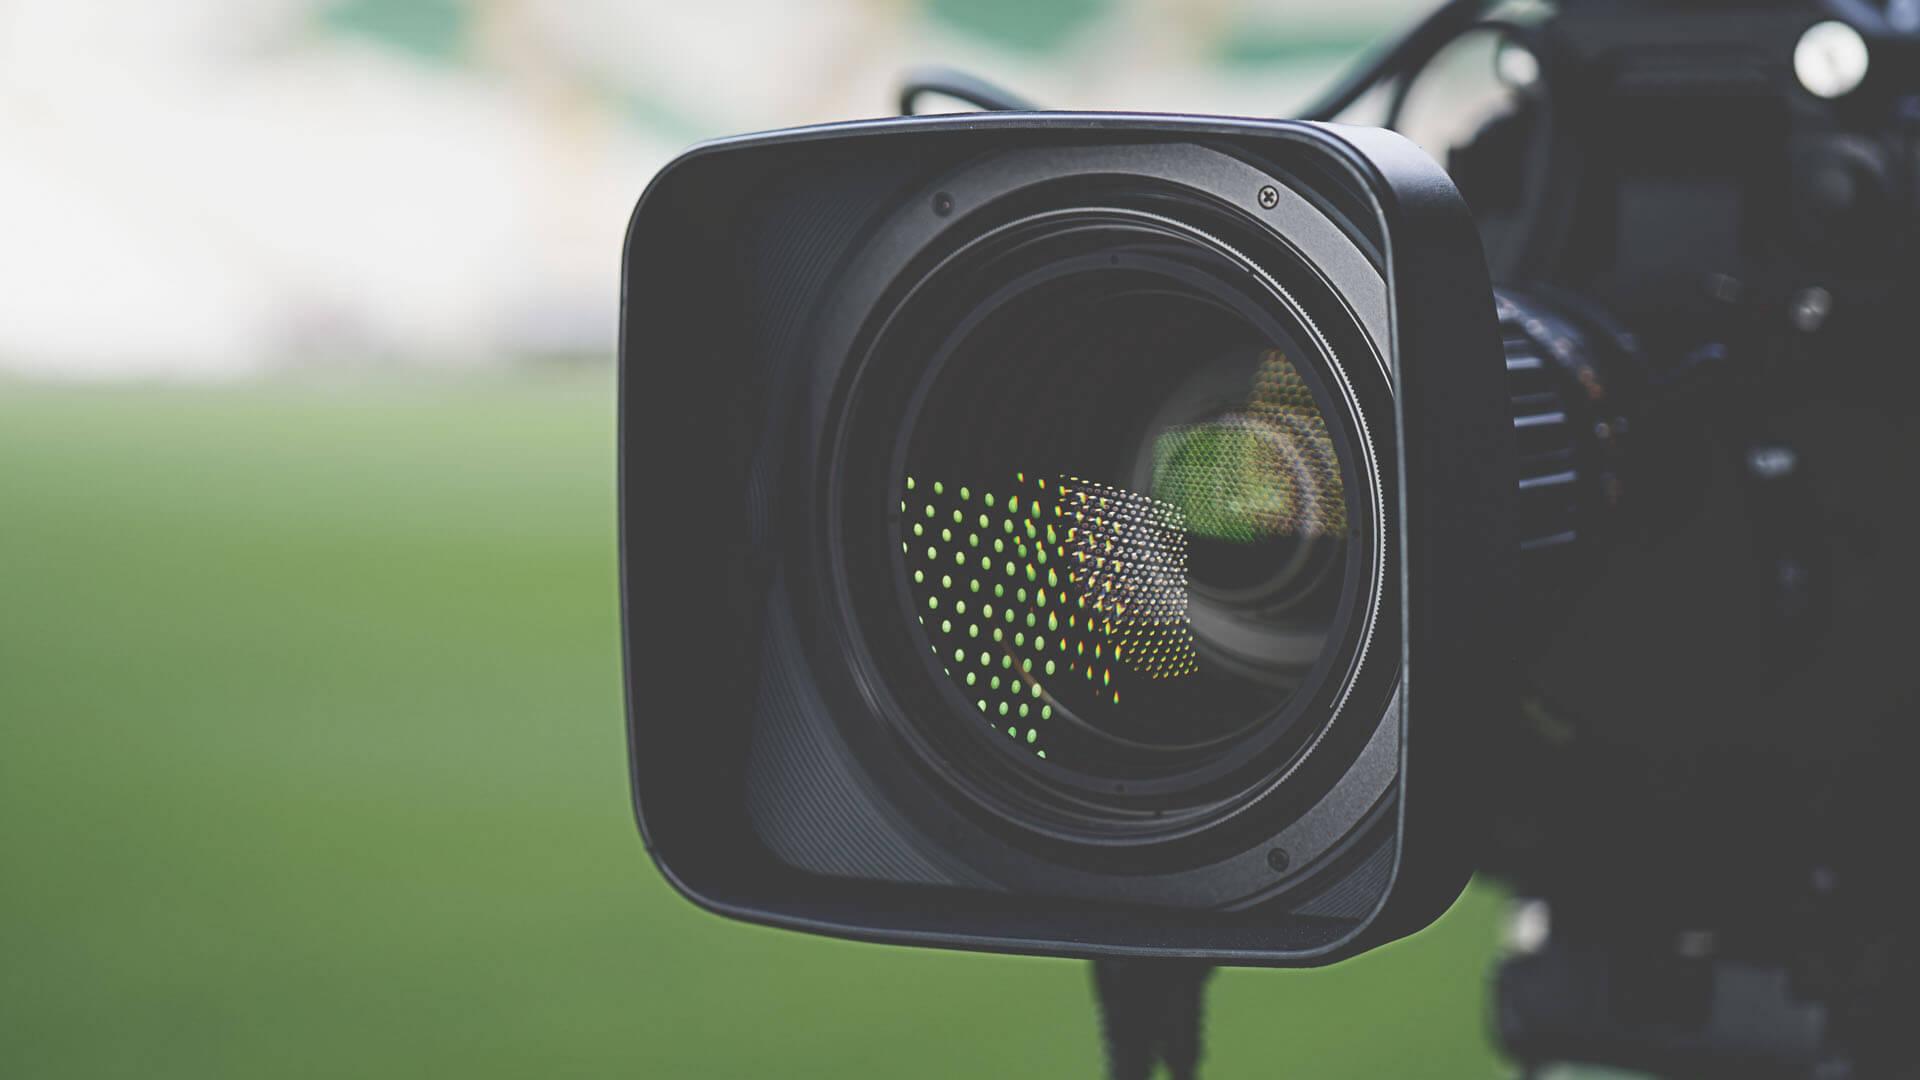 6 Ways Media Can Change the Script on Stigma